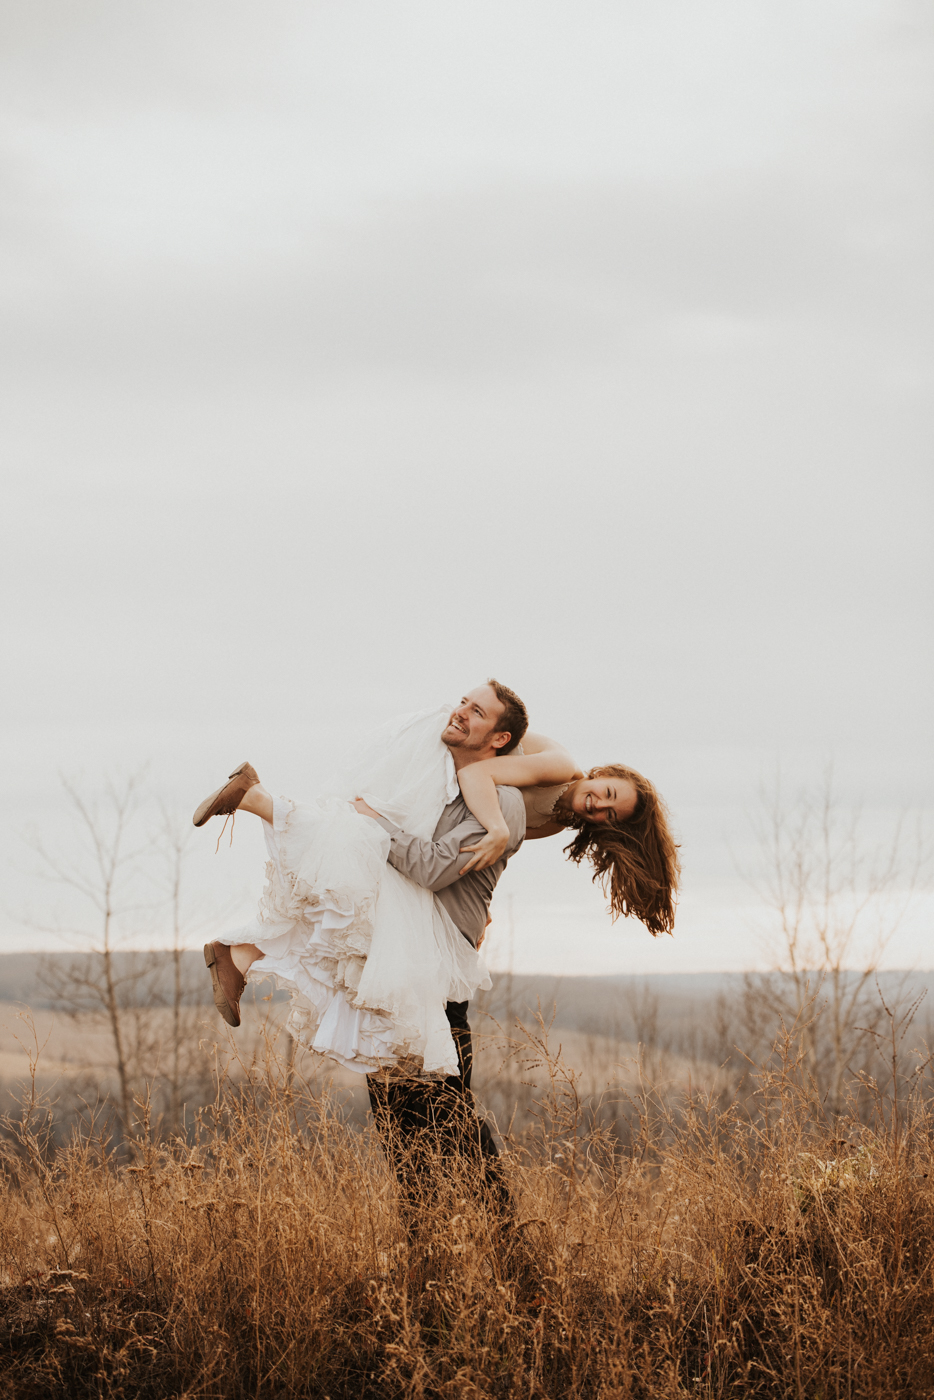 FortSt.John_photographer_TyraEPhotography_Wedding_Couple_Family_Photograhy_DawsonCreek_Elopement_Bride_Boduoir_Portraits-38.jpg